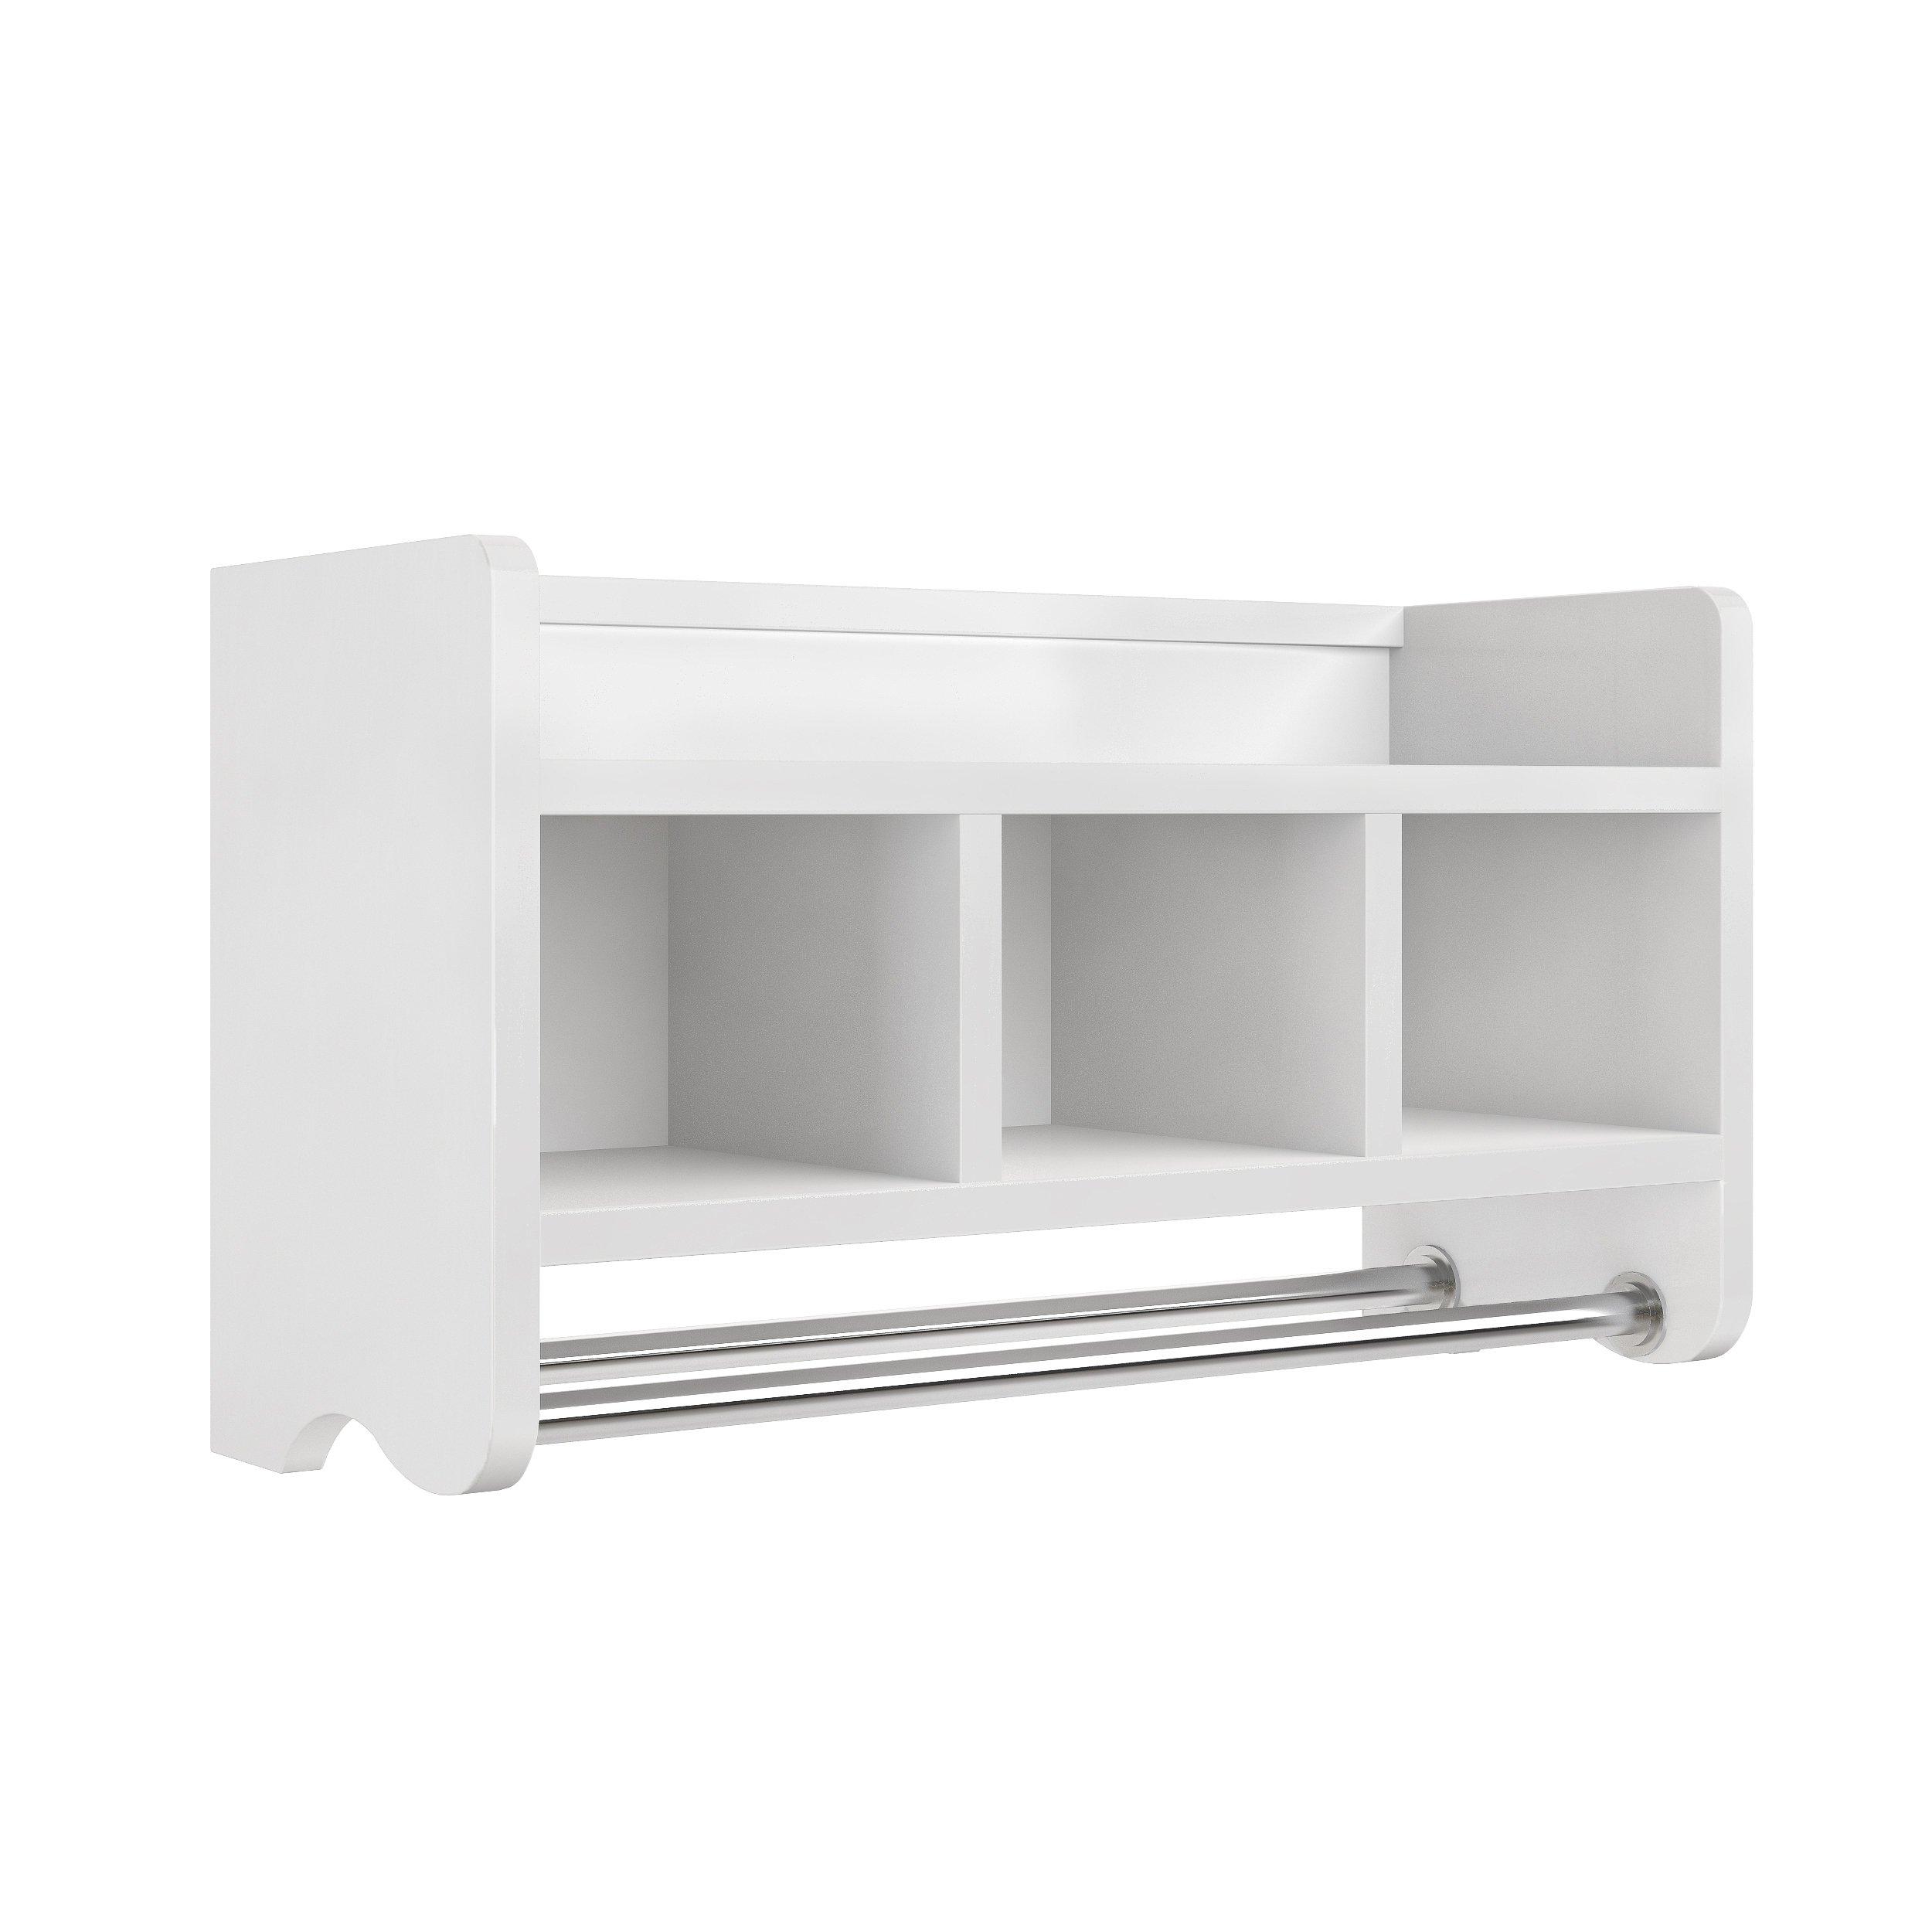 Logan 25'' Bath Storage Shelf with 3 Cubbies and Towel Rod, White